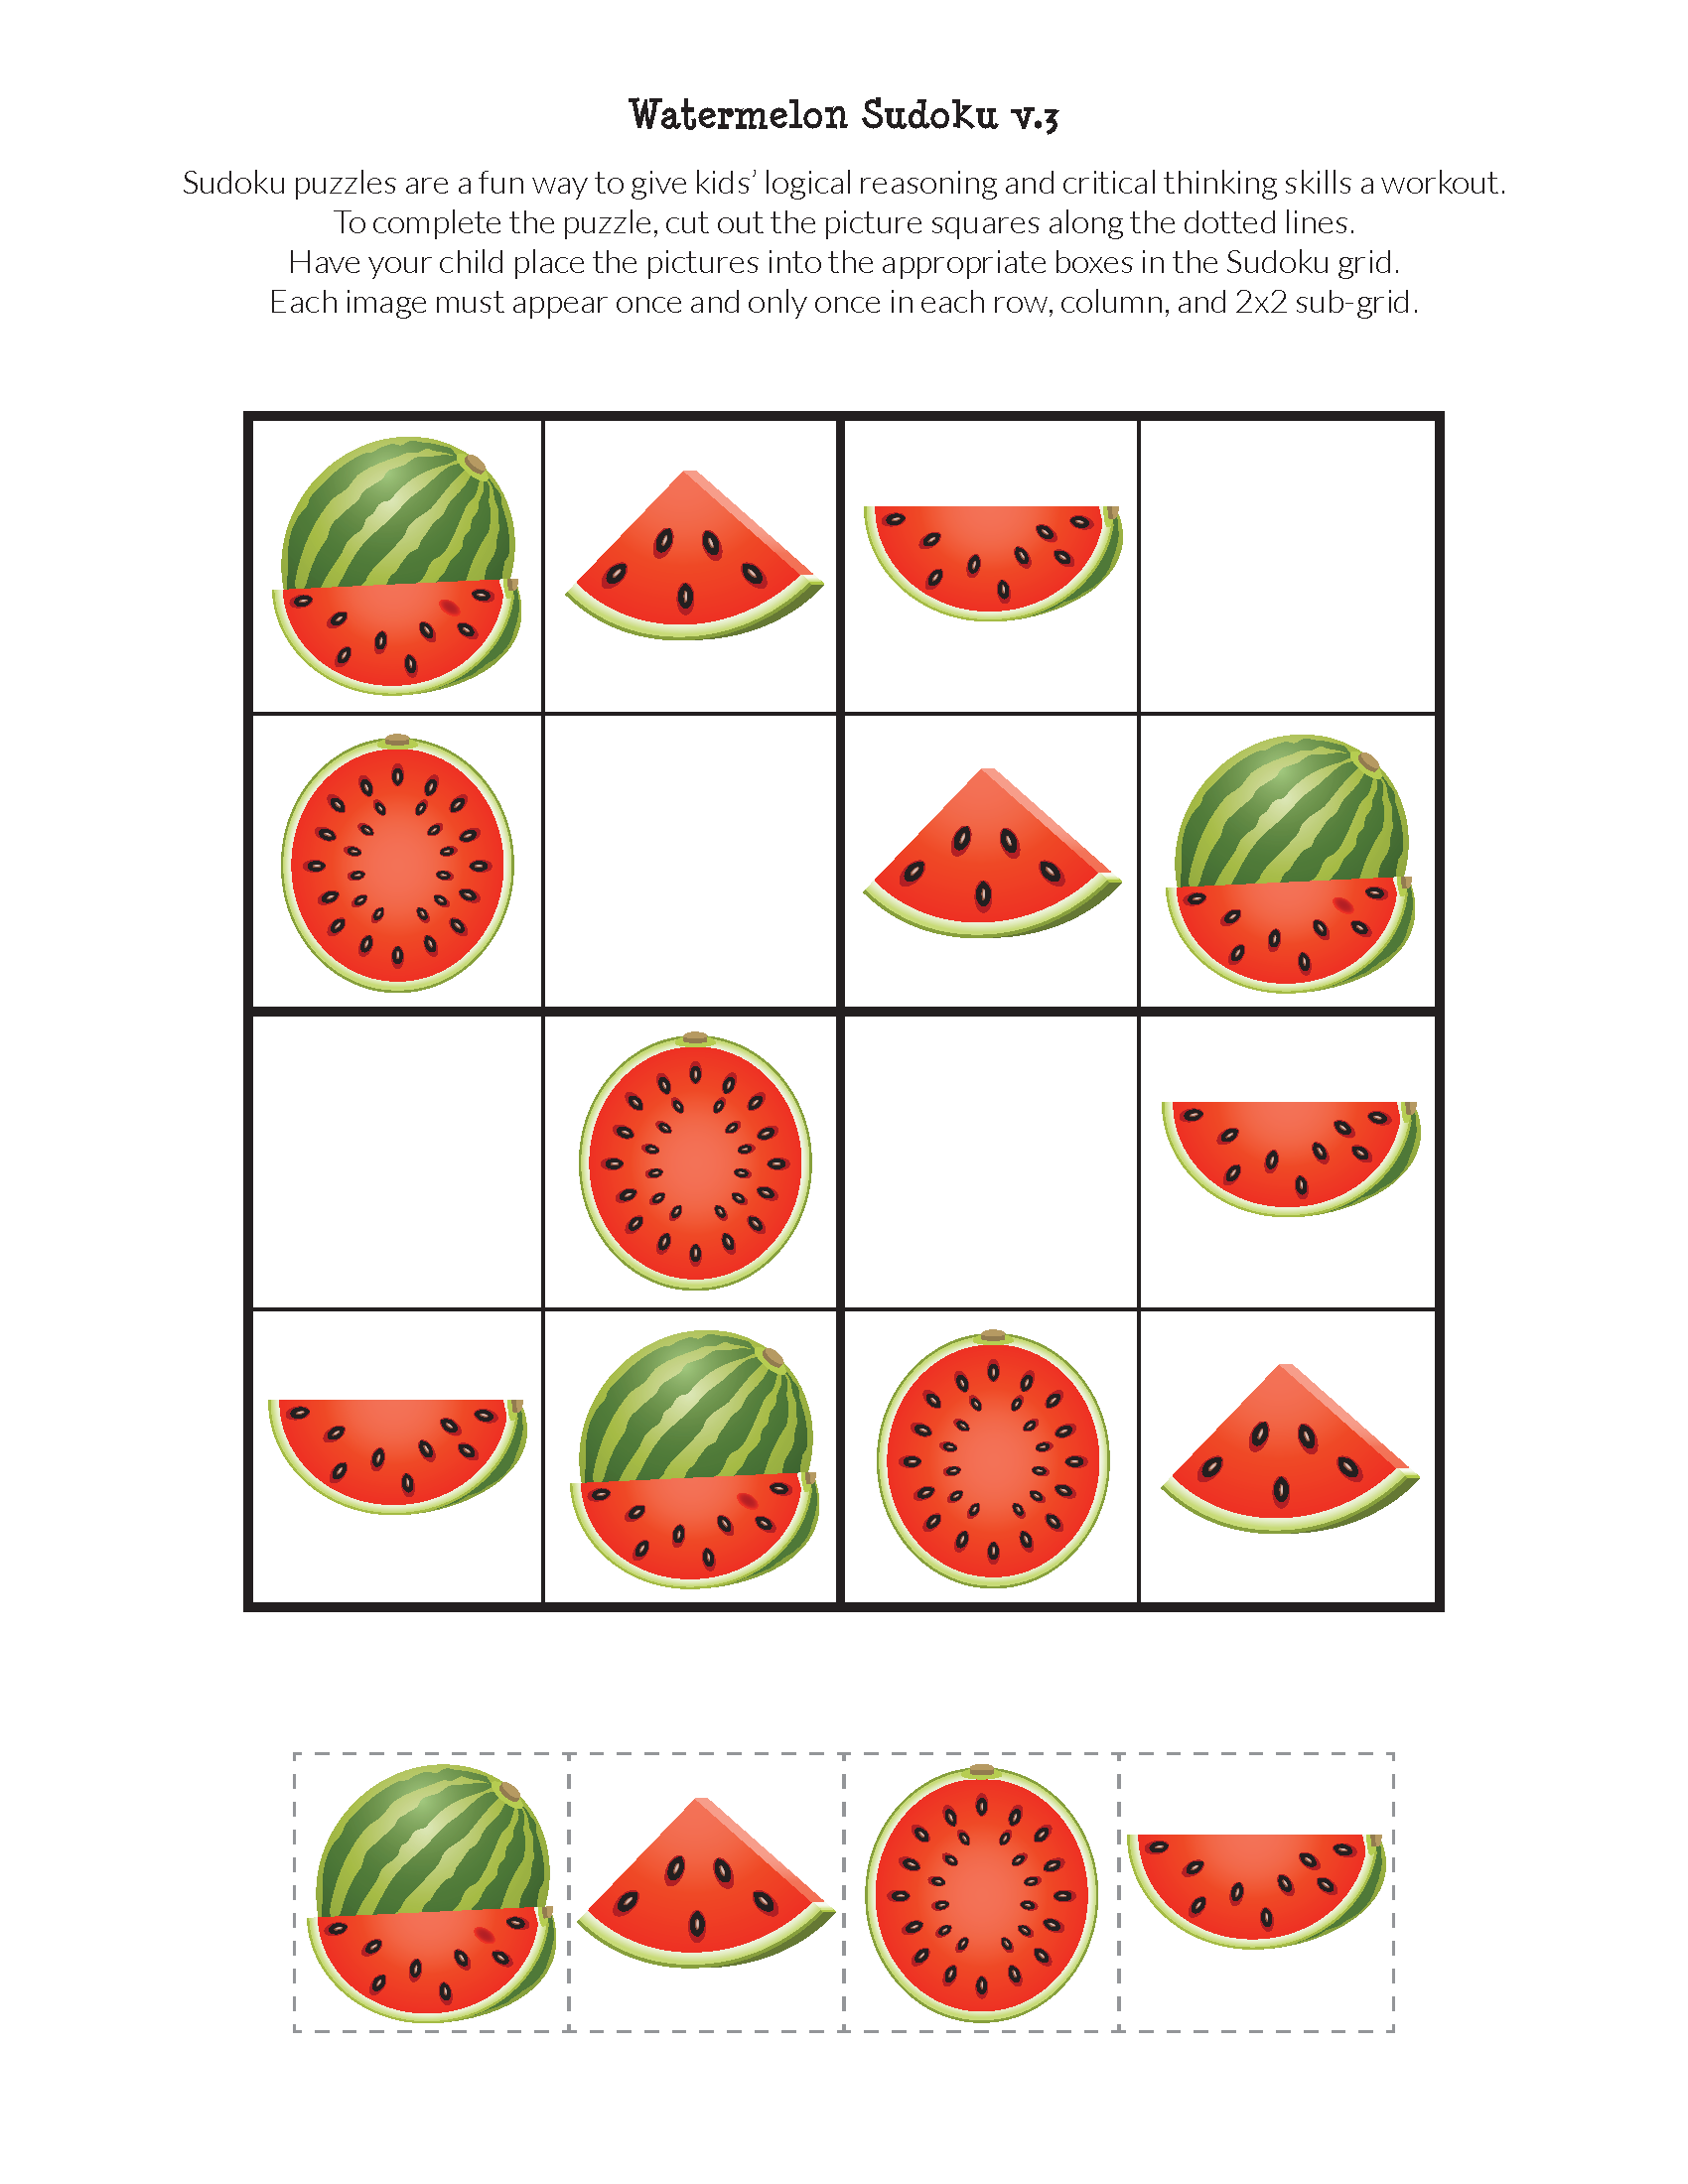 Watermelon Sudoku Puzzles Free Printables Sudoku Sudoku Puzzles Phonics For Kids [ 2200 x 1700 Pixel ]